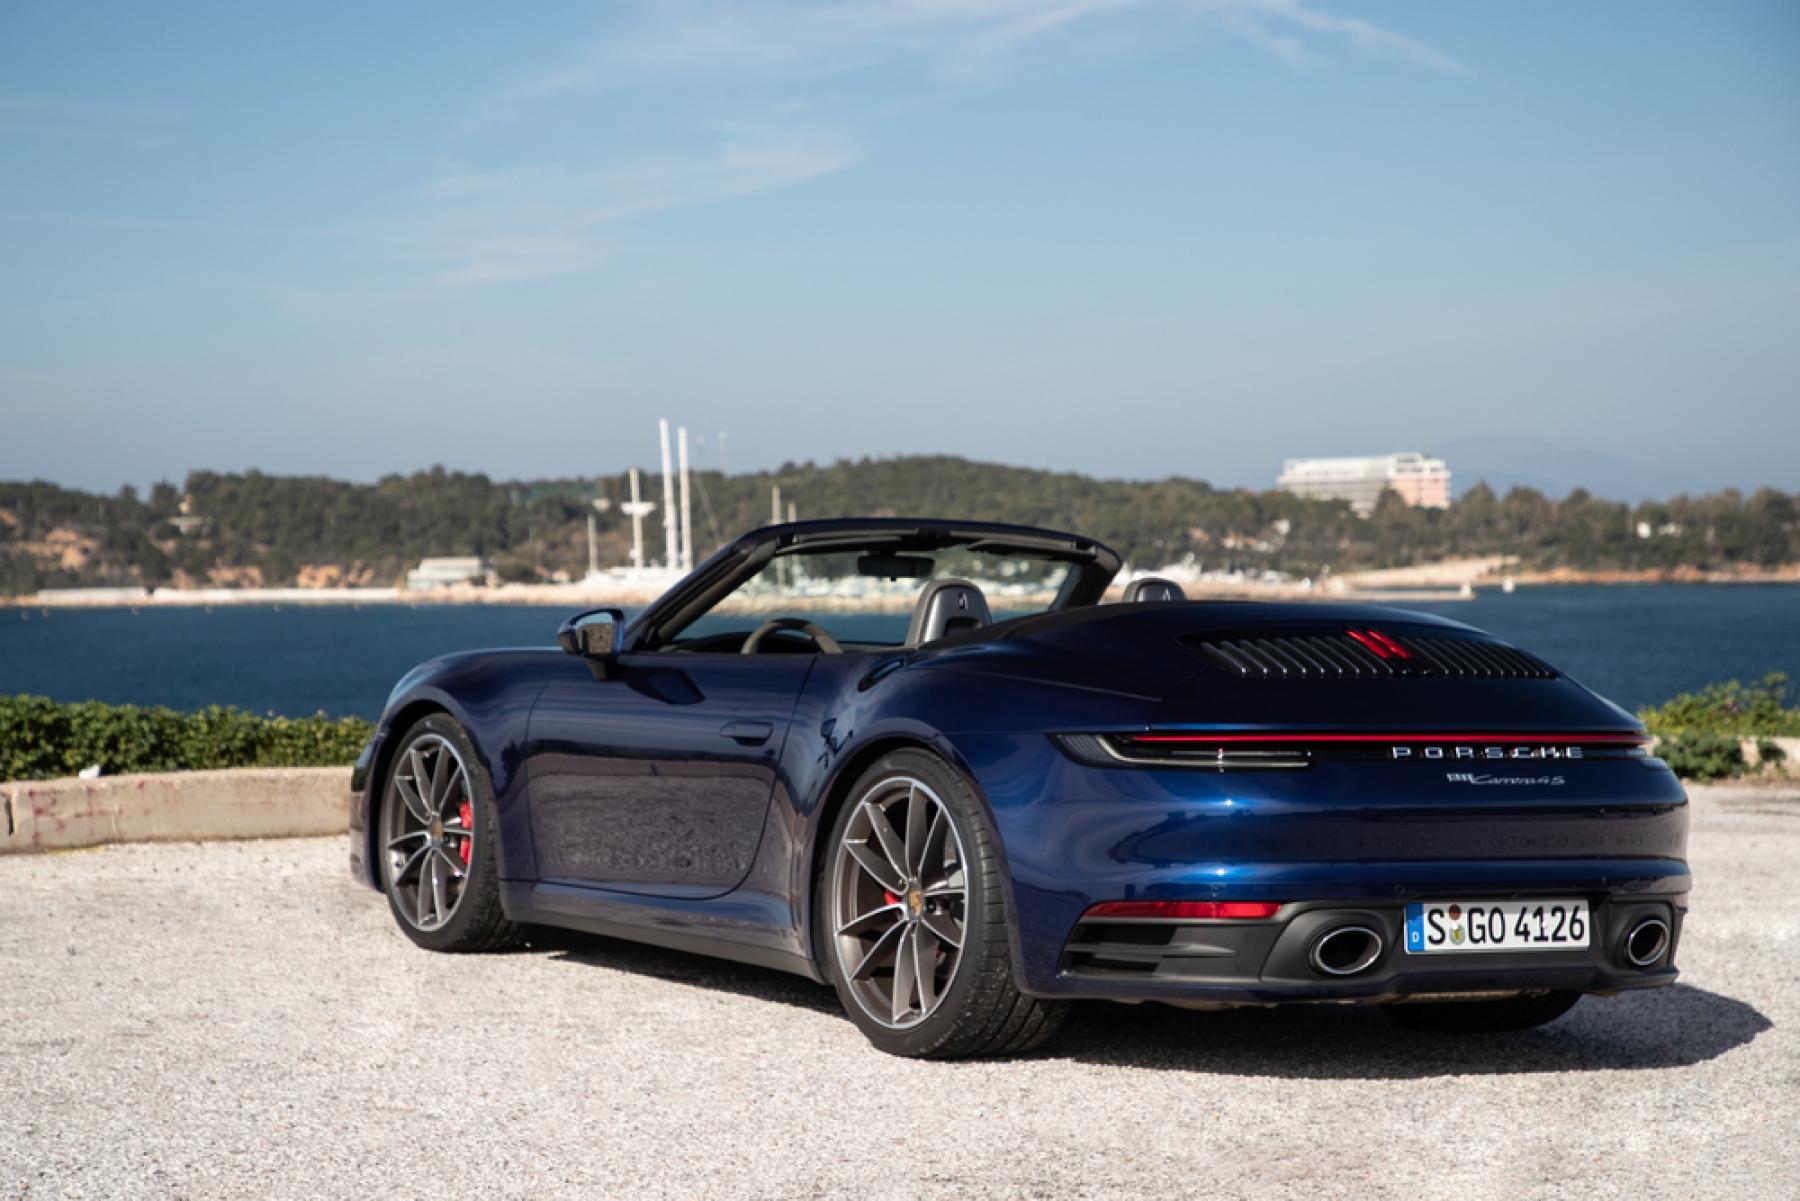 911 Carrera 4s Cabriolet Gentian Blue Metallic S Go 4126 The New Porsche 911 Cabriolet